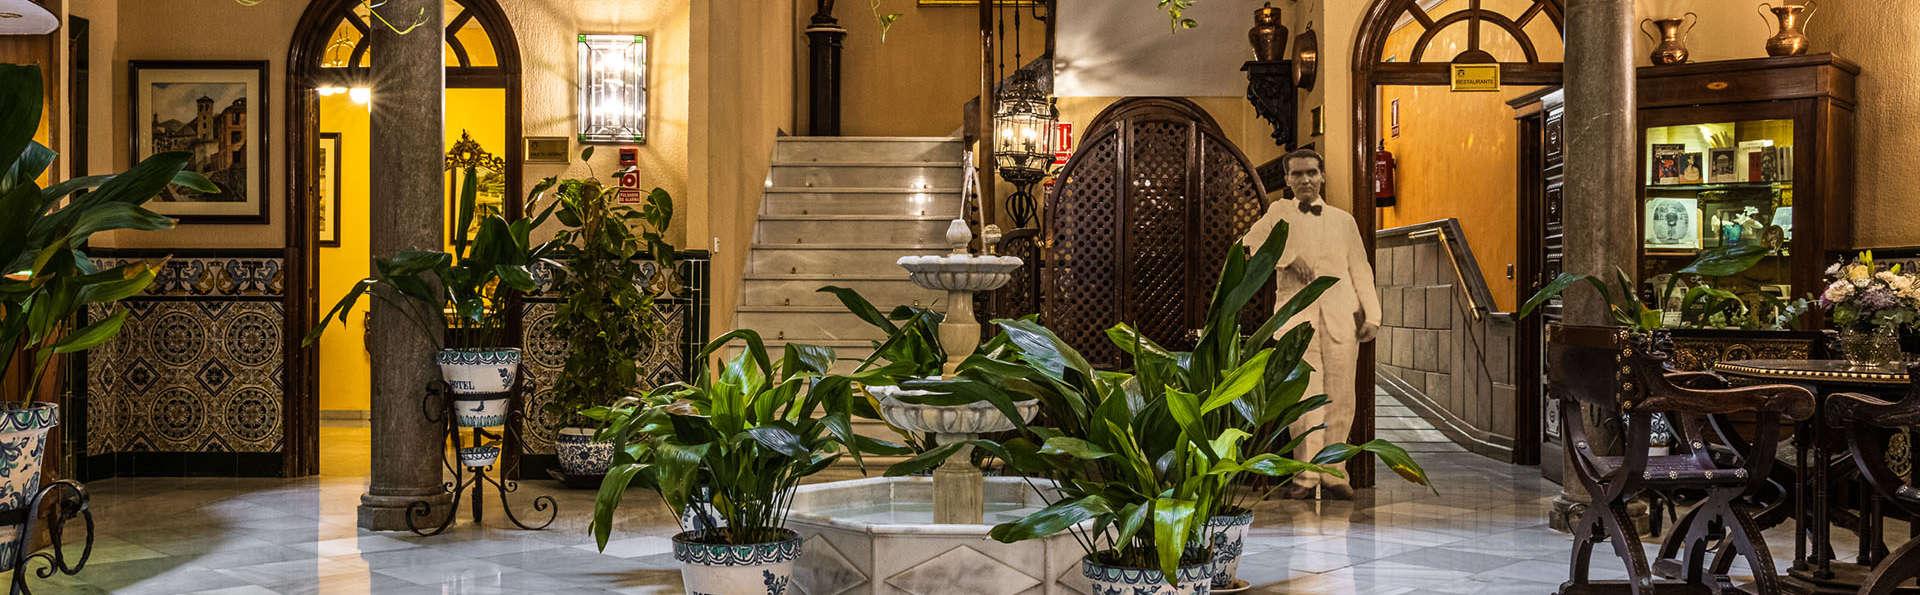 Hotel Reina Cristina - EDIT_HALL.jpg